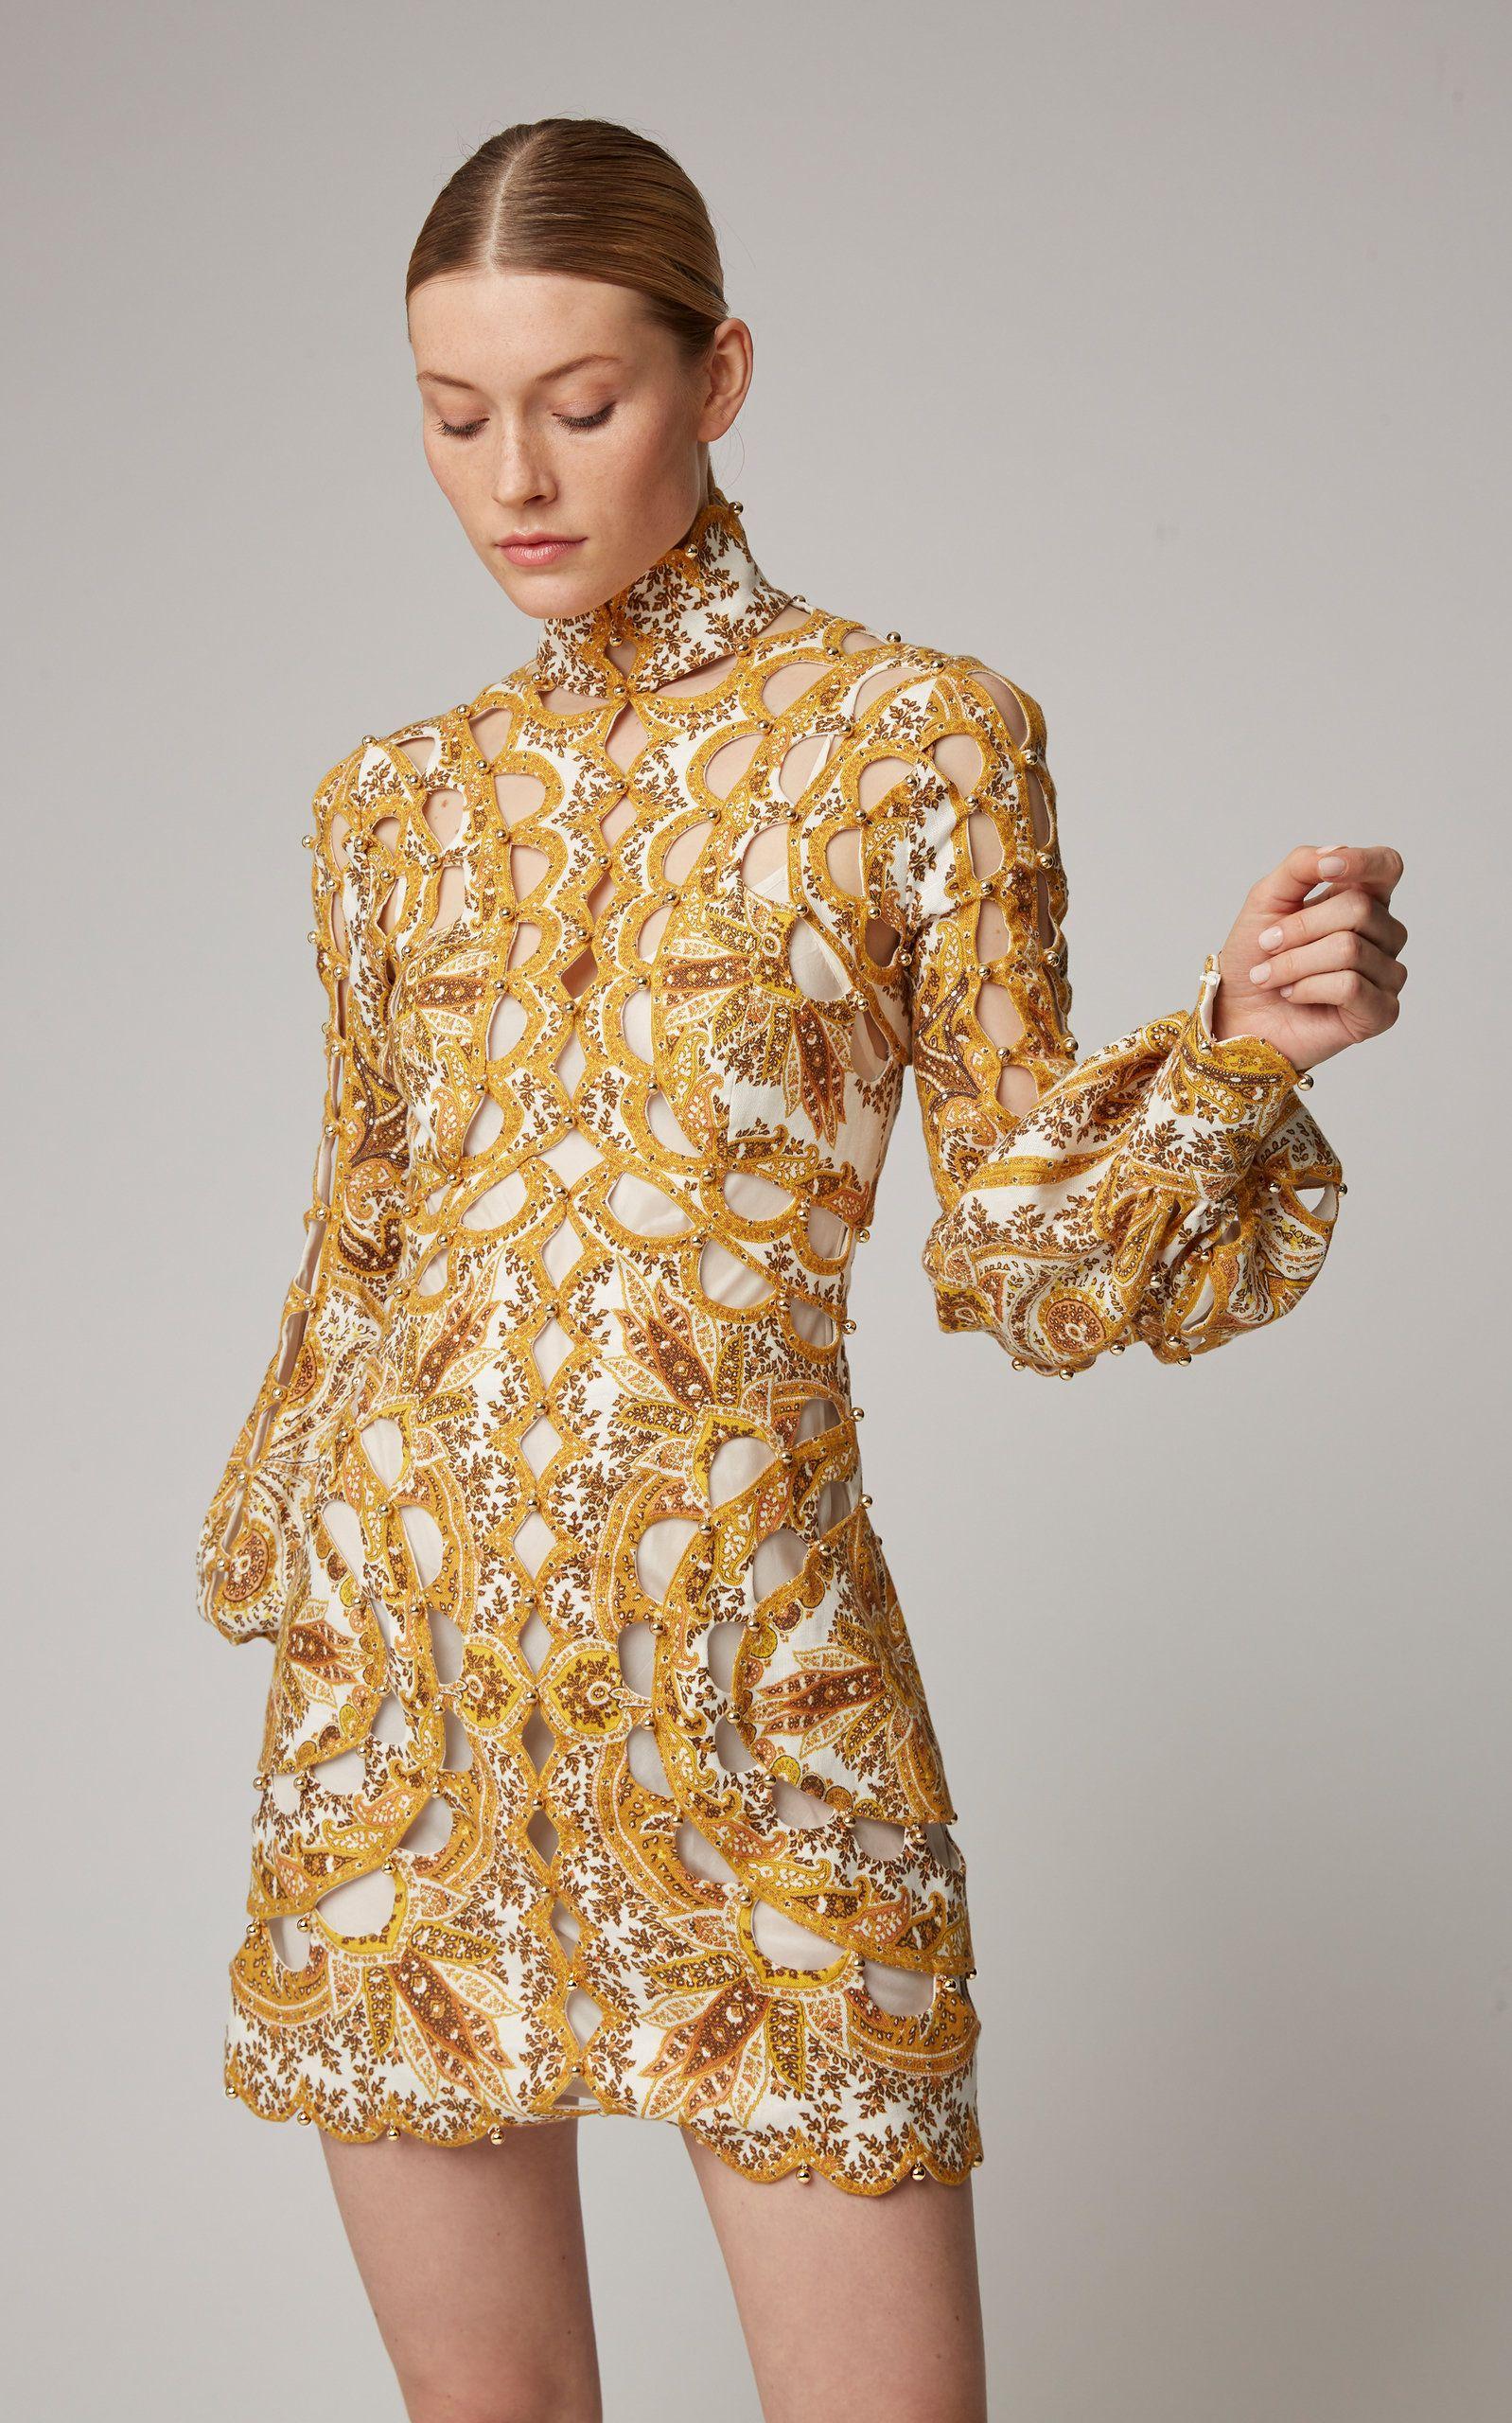 23a991cba5 Zippy Scallop Beaded Silk And Linen-Blend Mini Dress in 2019 ...